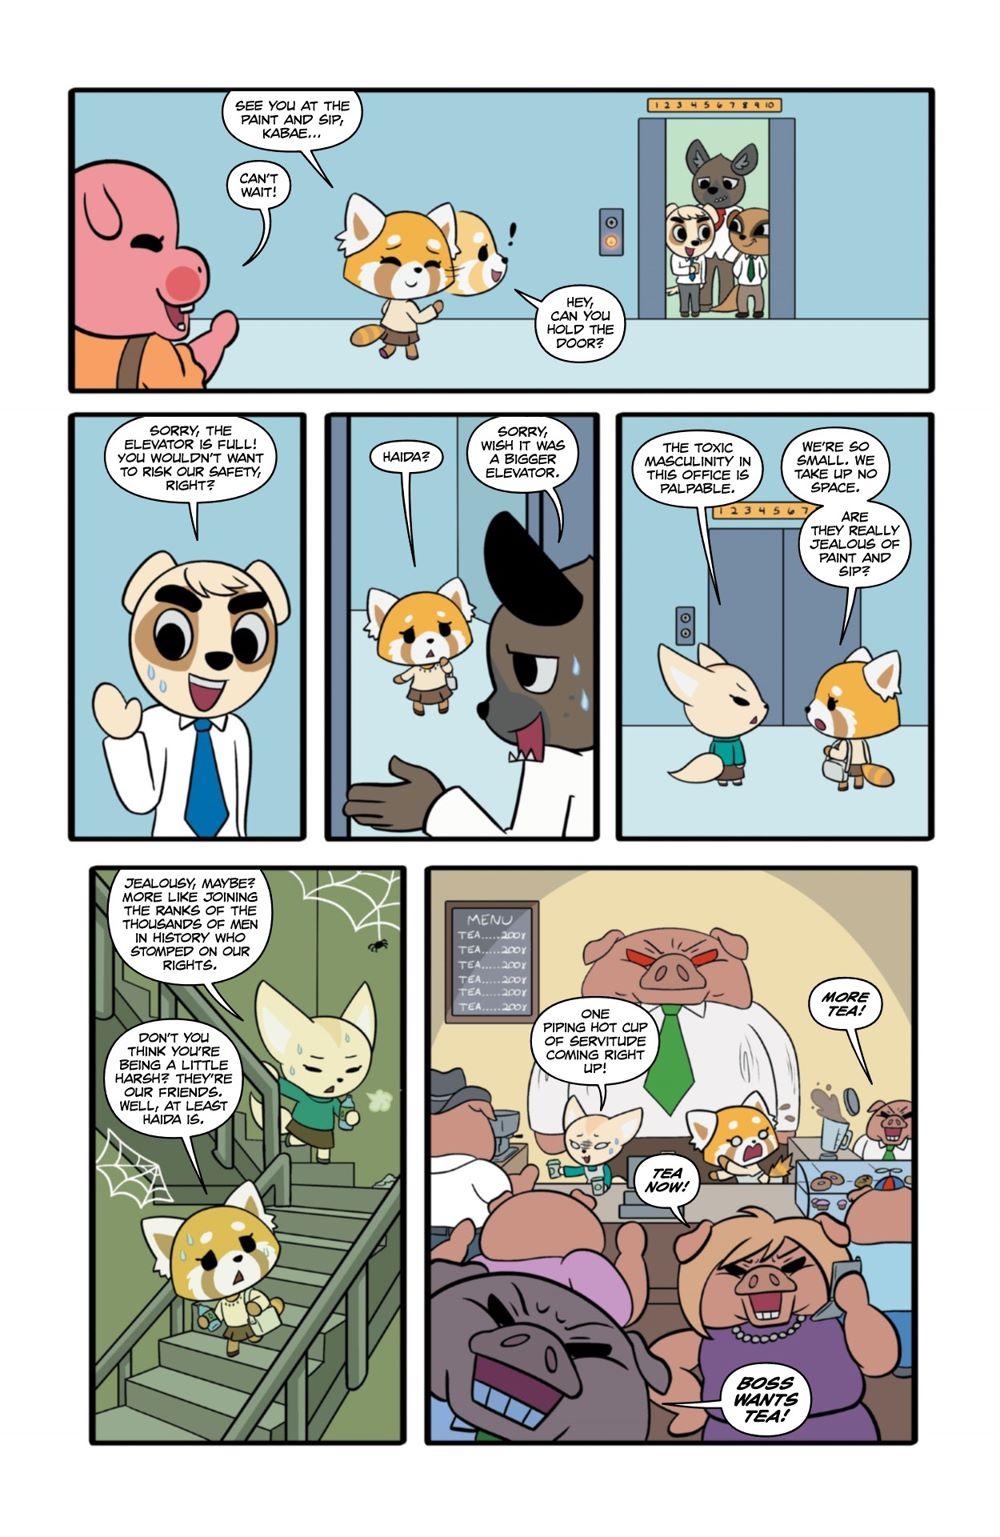 AGGRETSUKO-MHW-2-MARKETING-08-1 ComicList Previews: AGGRETSUKO MEET HER WORLD #2